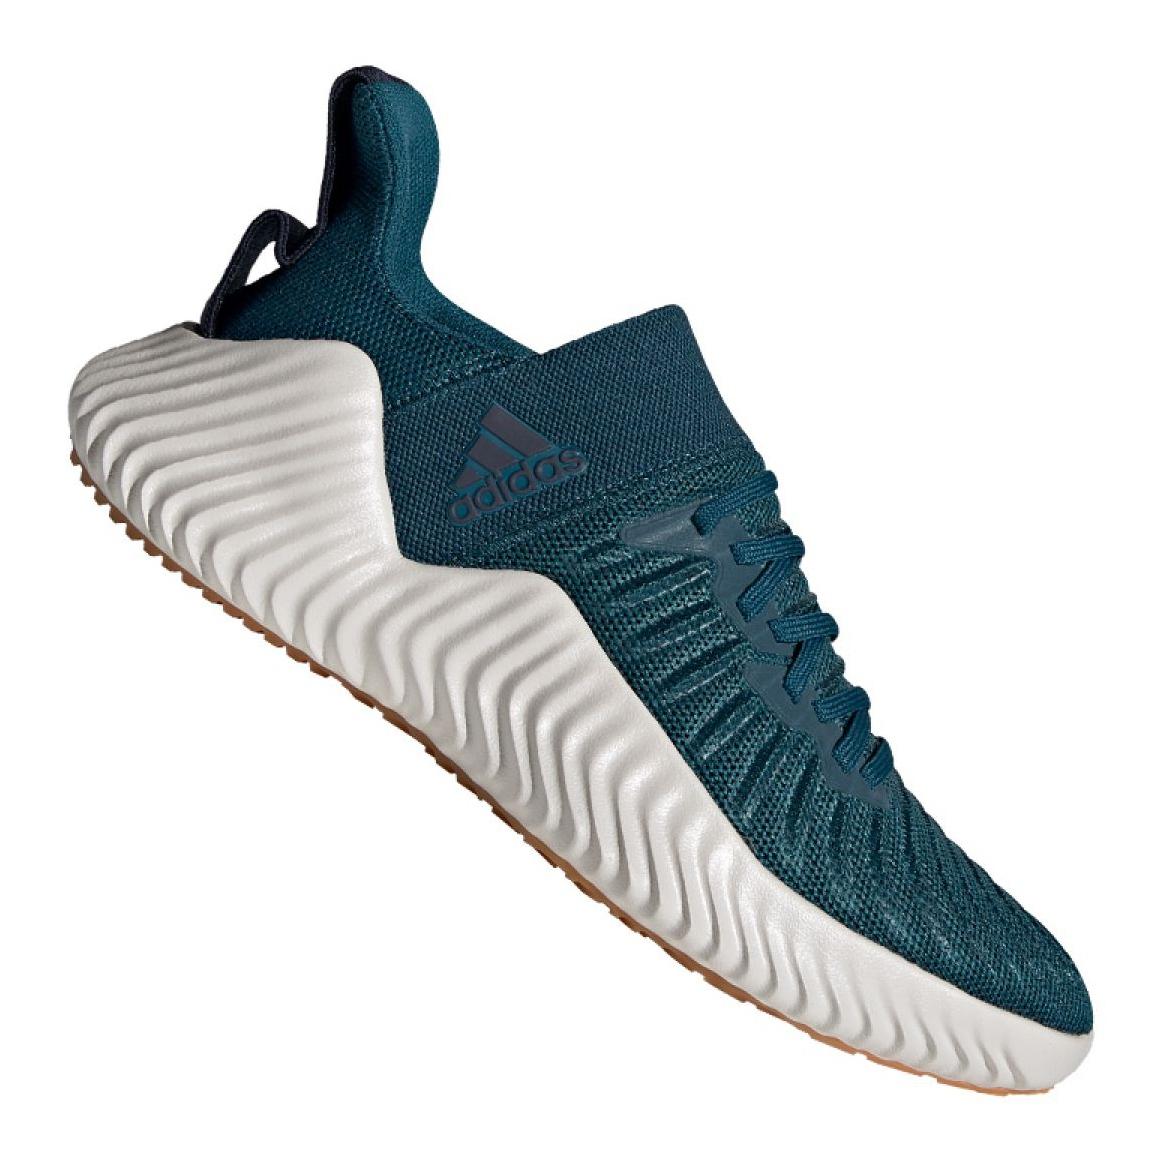 Schuhe adidas Herren Alphabounce Trainer M Fitnessschuhe